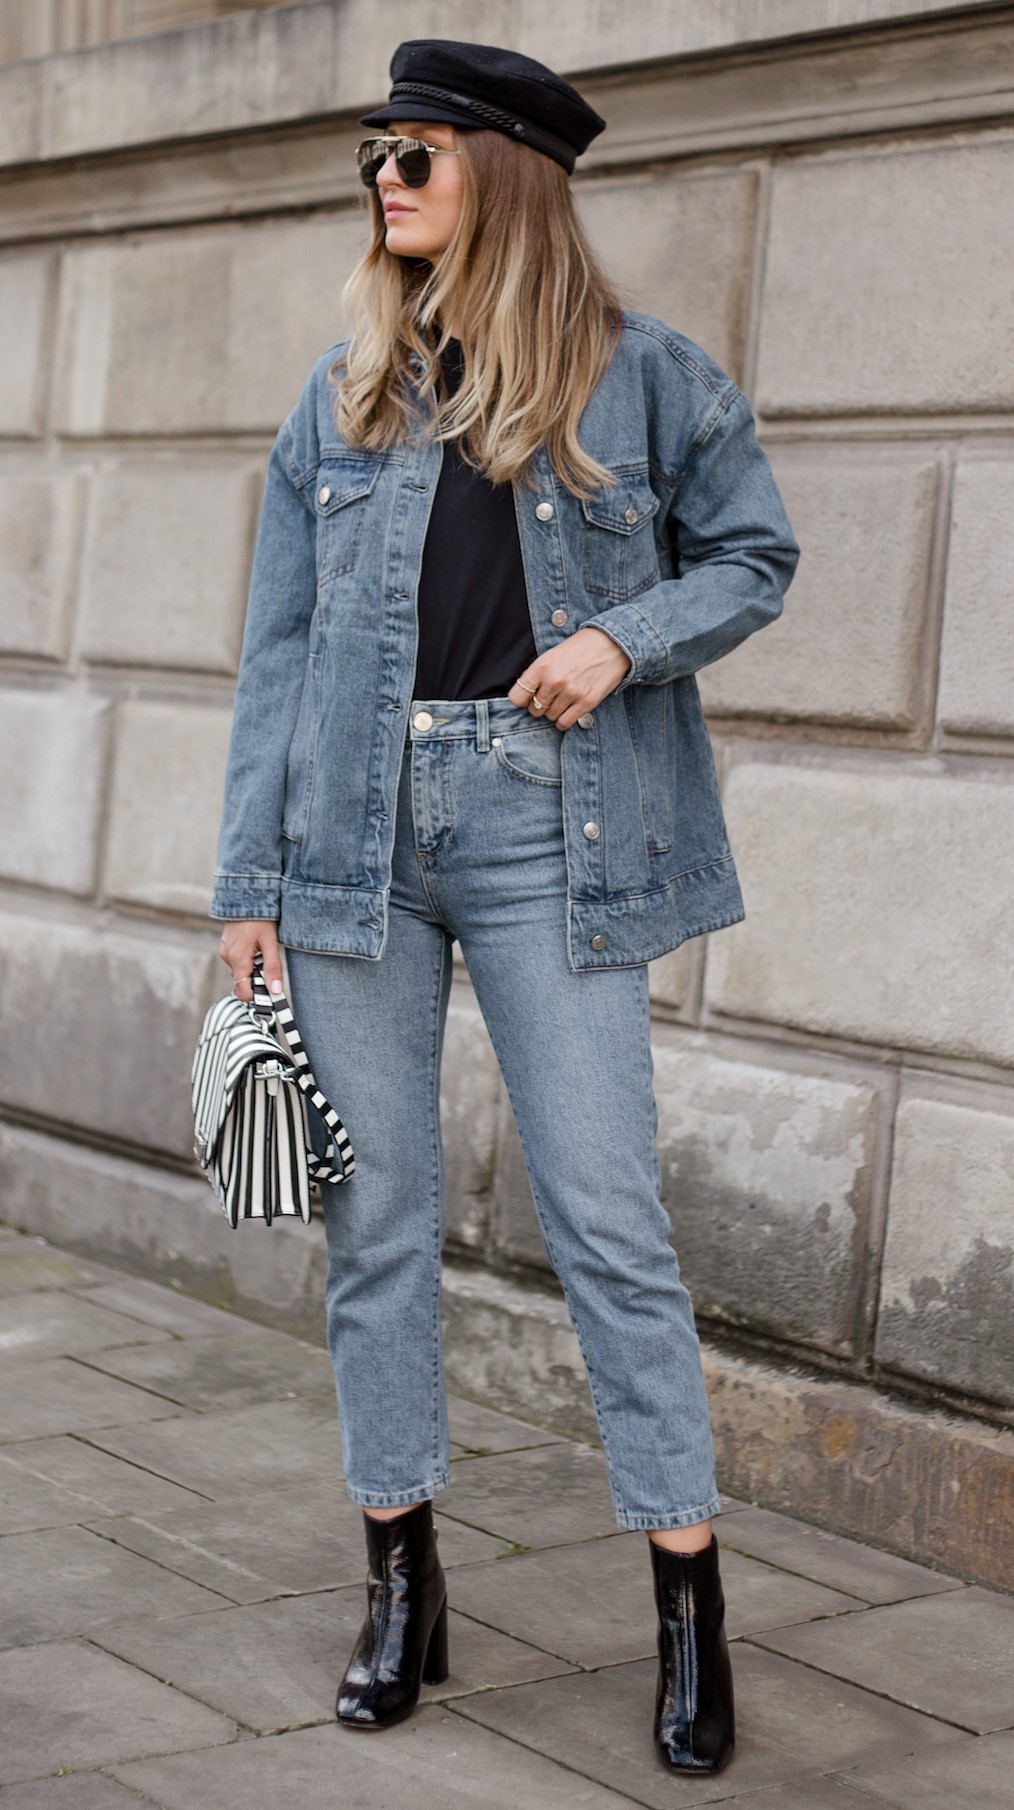 blue-light-skinny-jeans-black-tee-blue-light-jacket-jean-white-bag-black-shoe-booties-blonde-sun-hat-fall-winter-weekend.jpg